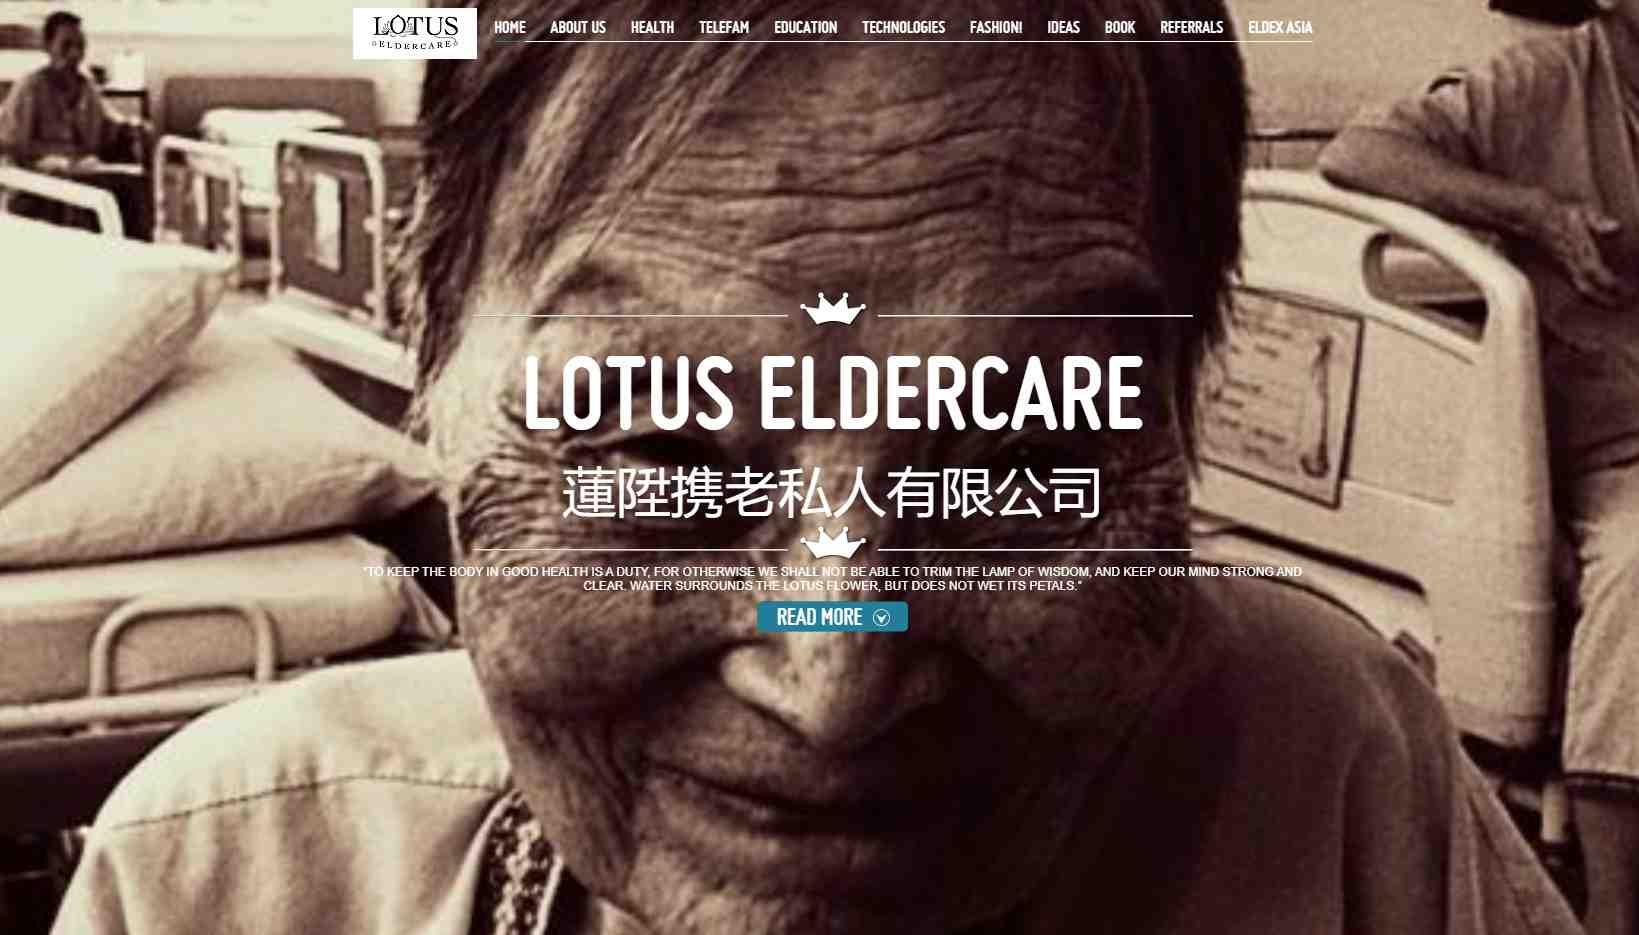 lotus elder care Top Gerontologists in Singapore